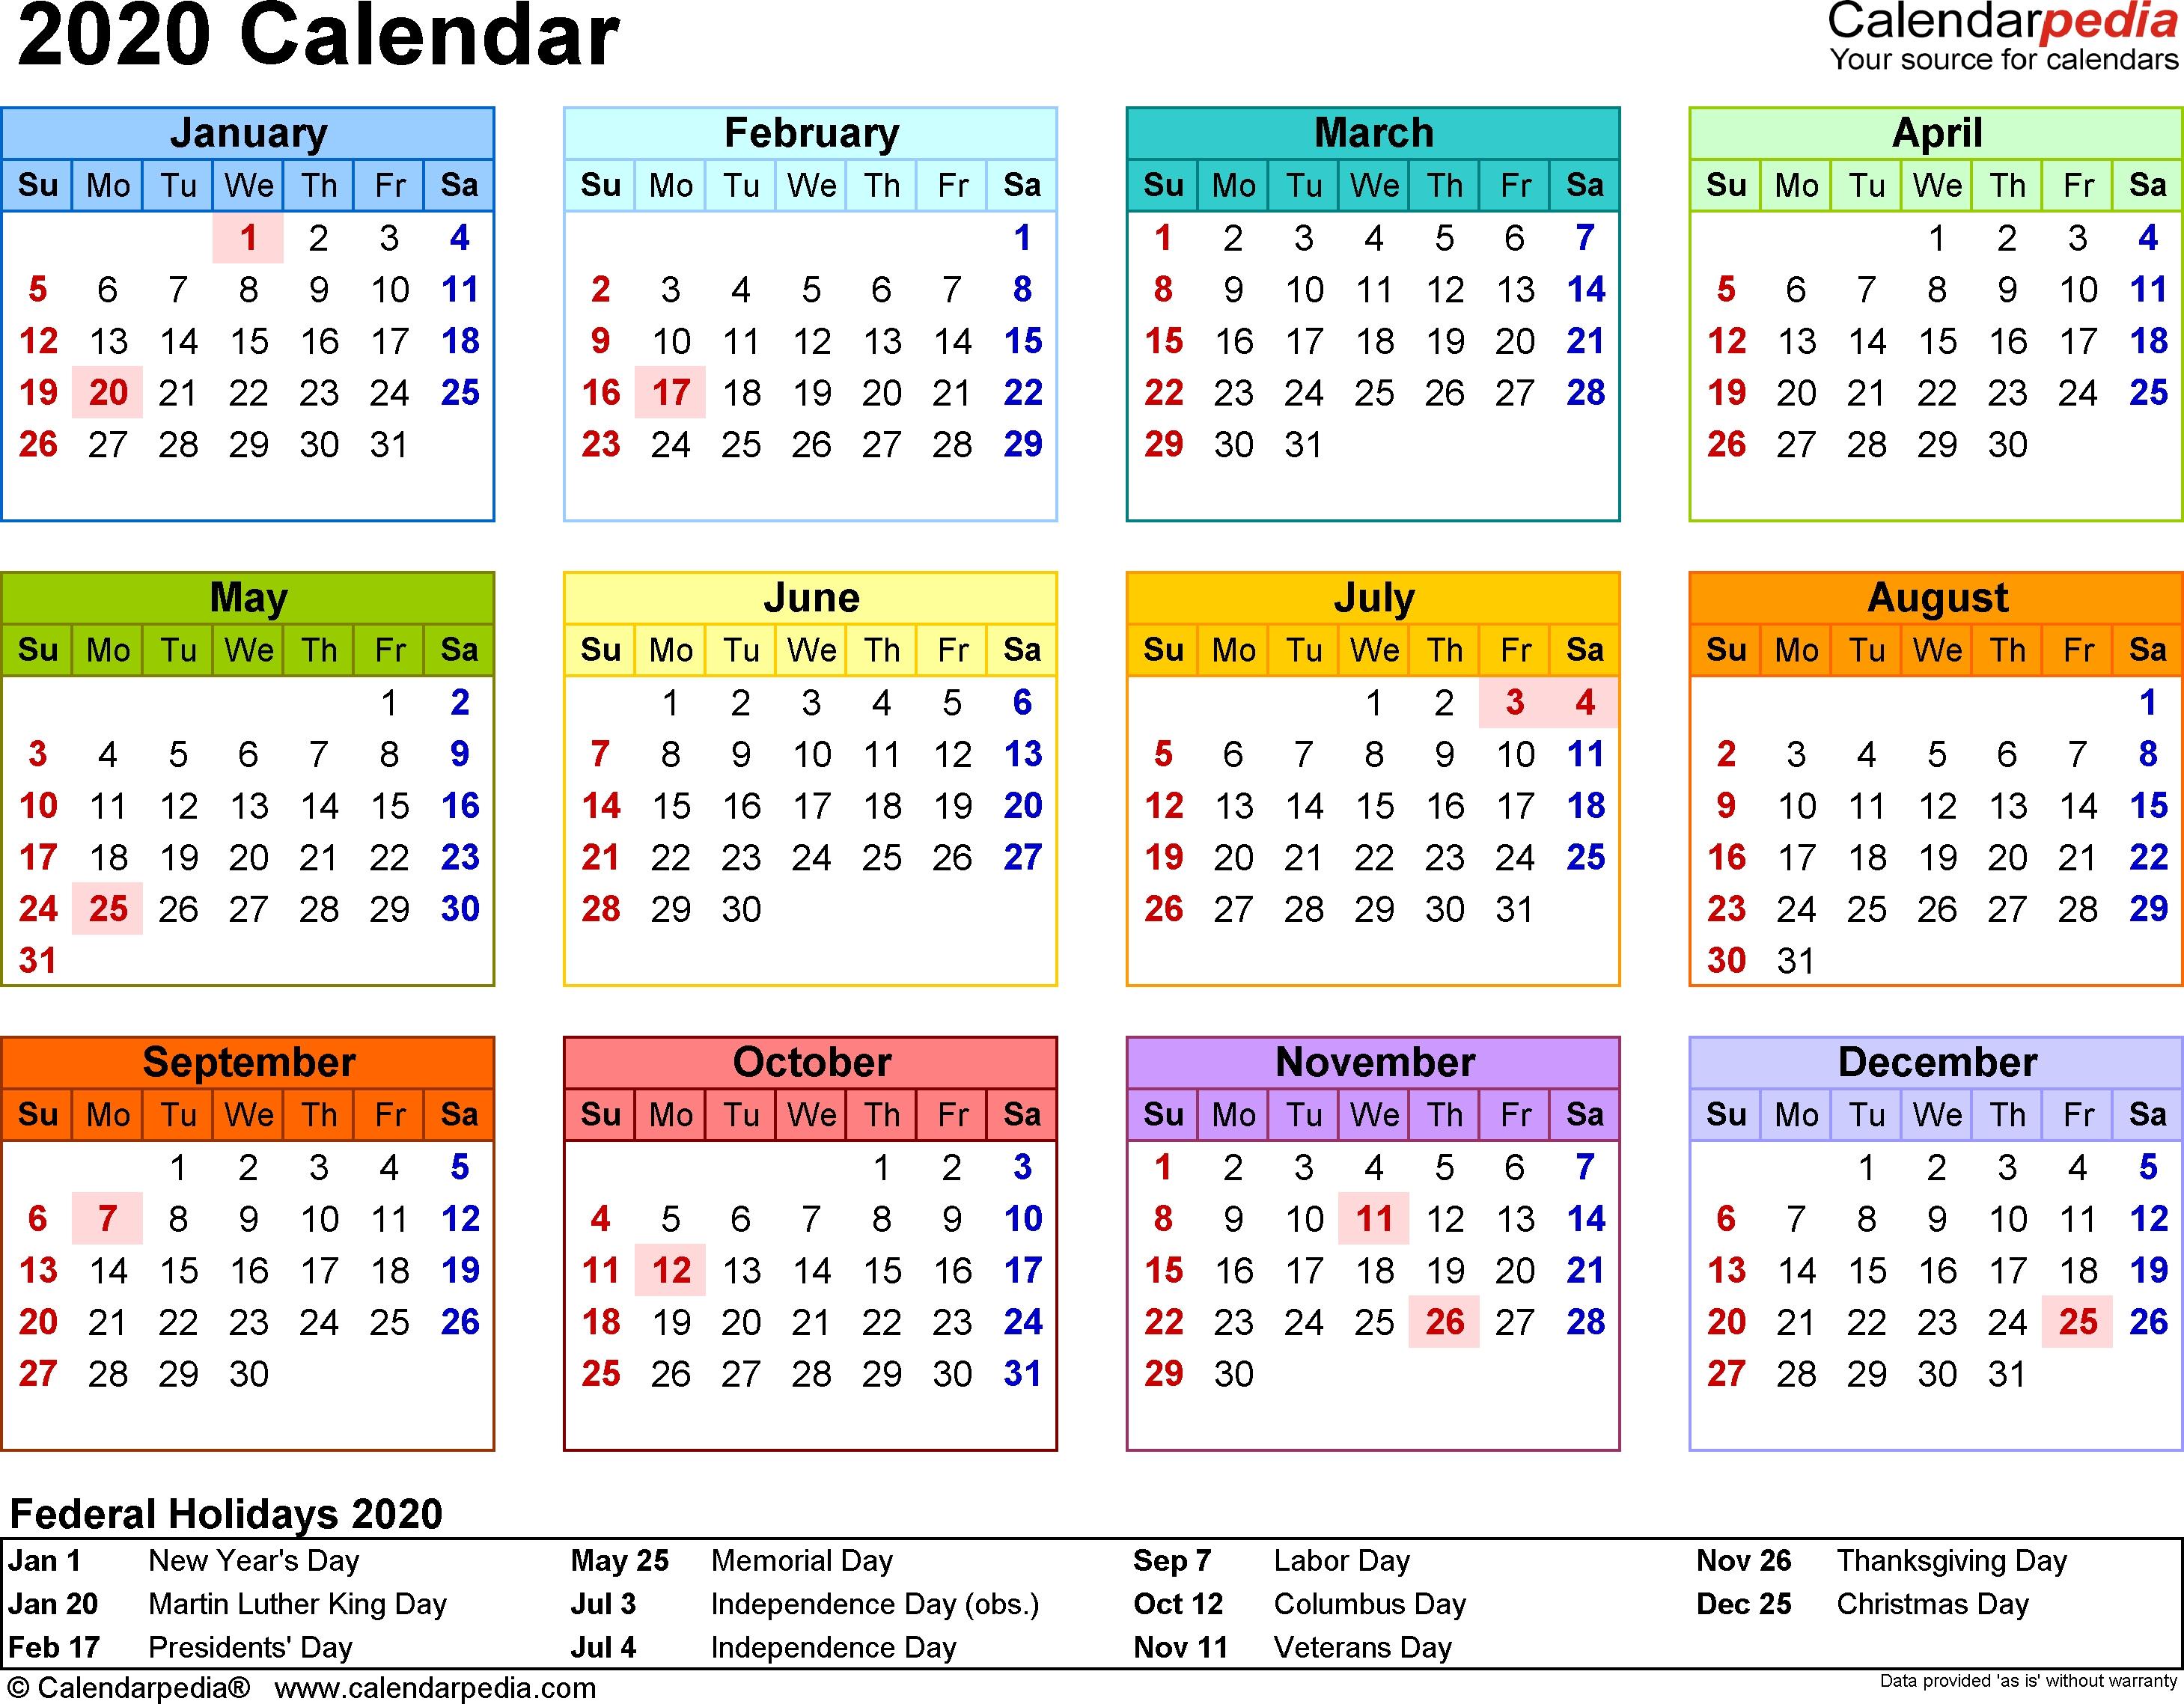 2020 Calendar Pdf - 17 Free Printable Calendar Templates intended for Large Print 2020 Calendar To Print Free